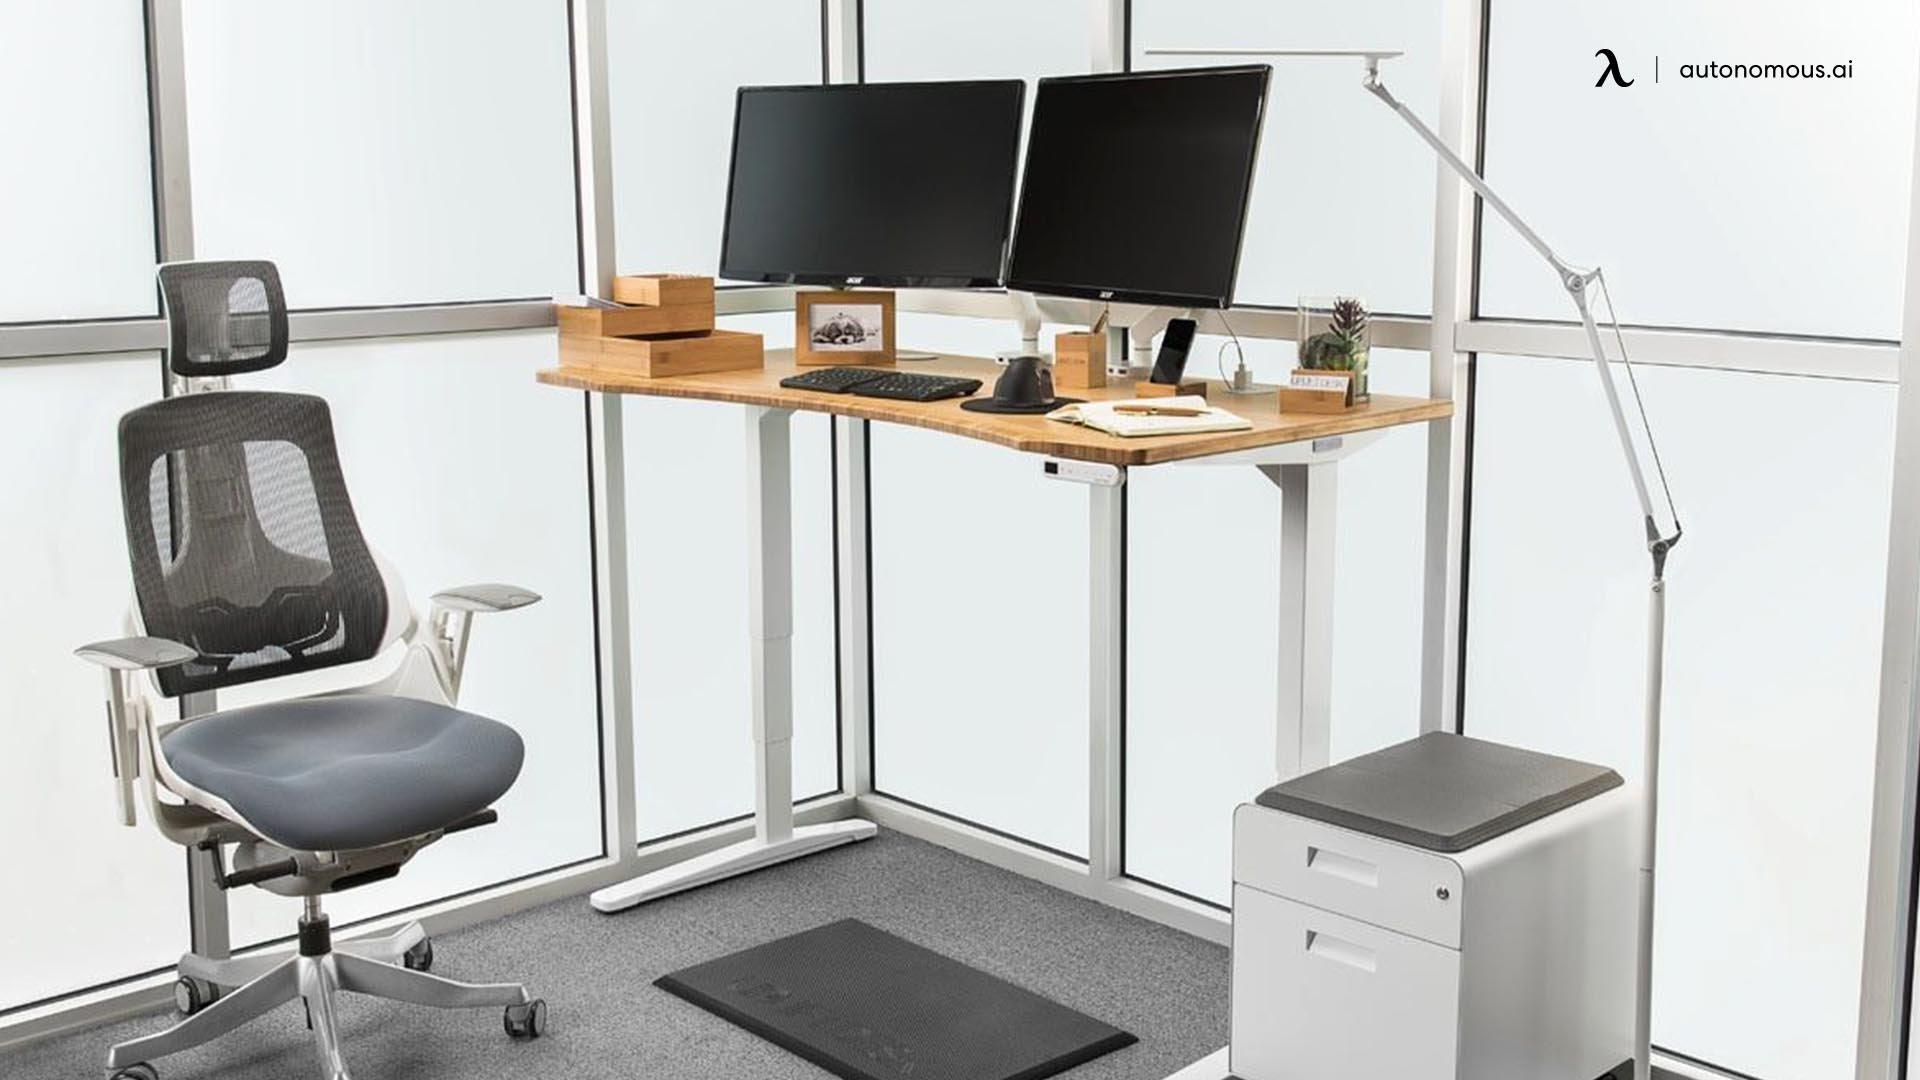 The UPLIFT Bamboo Standing desk